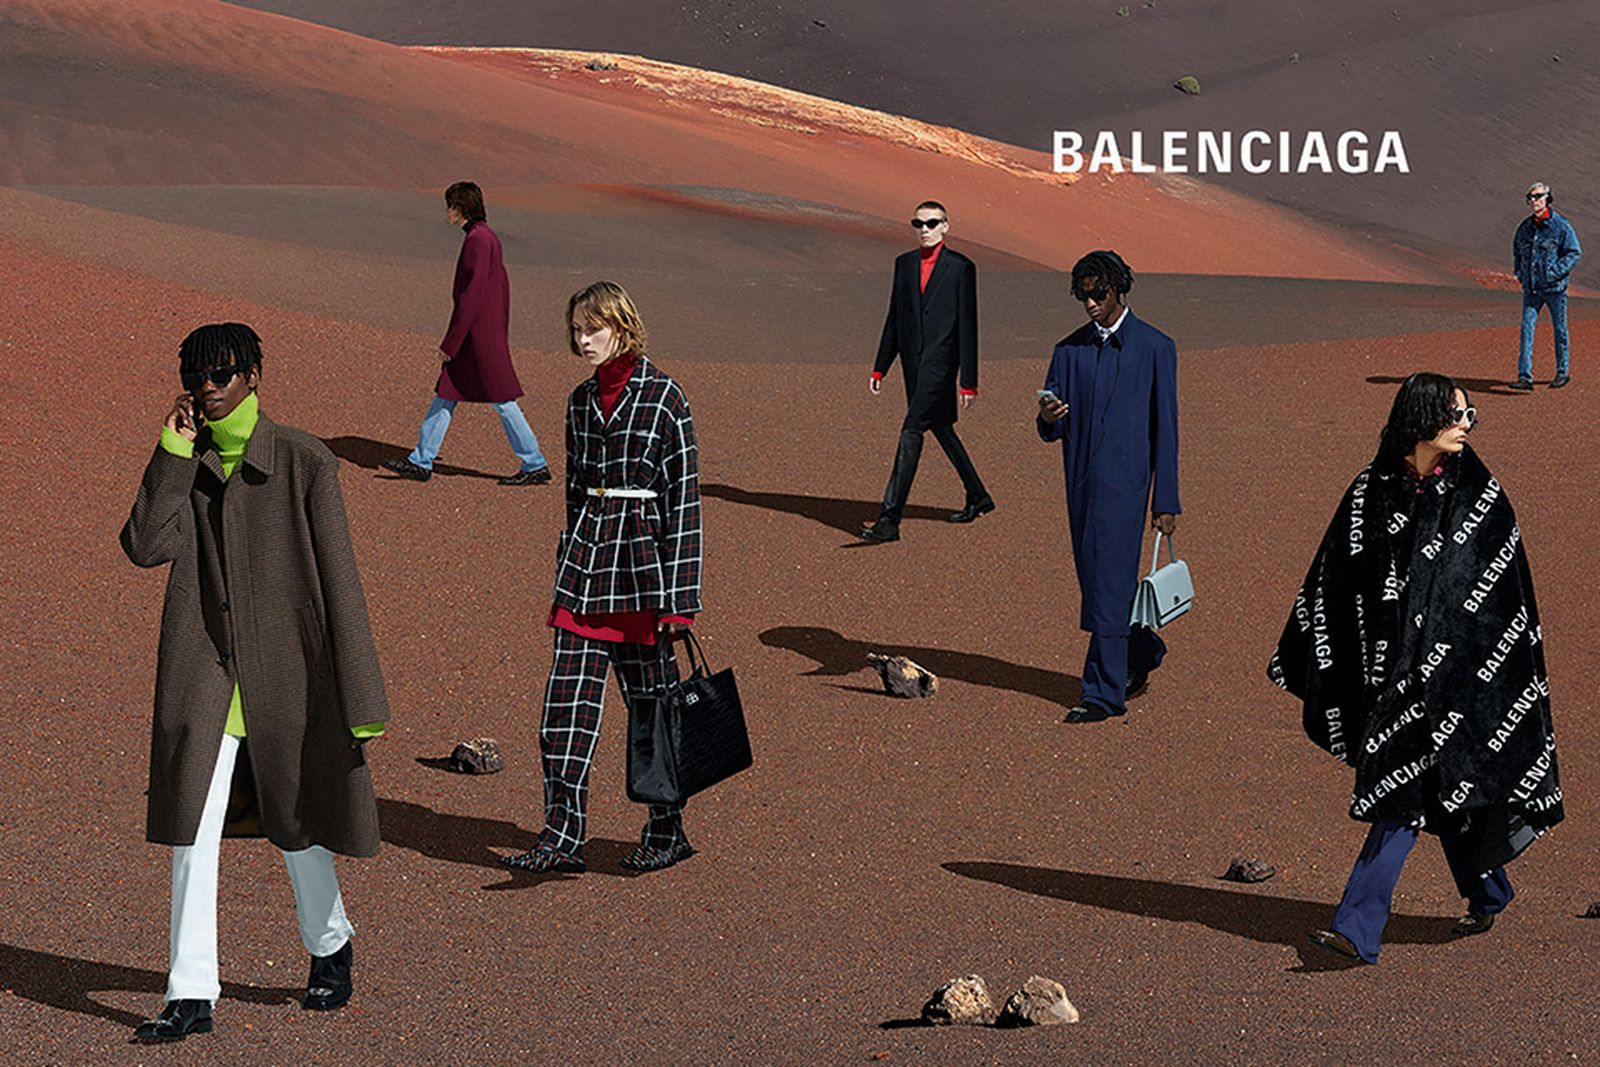 balenciaga fall 2019 campaign